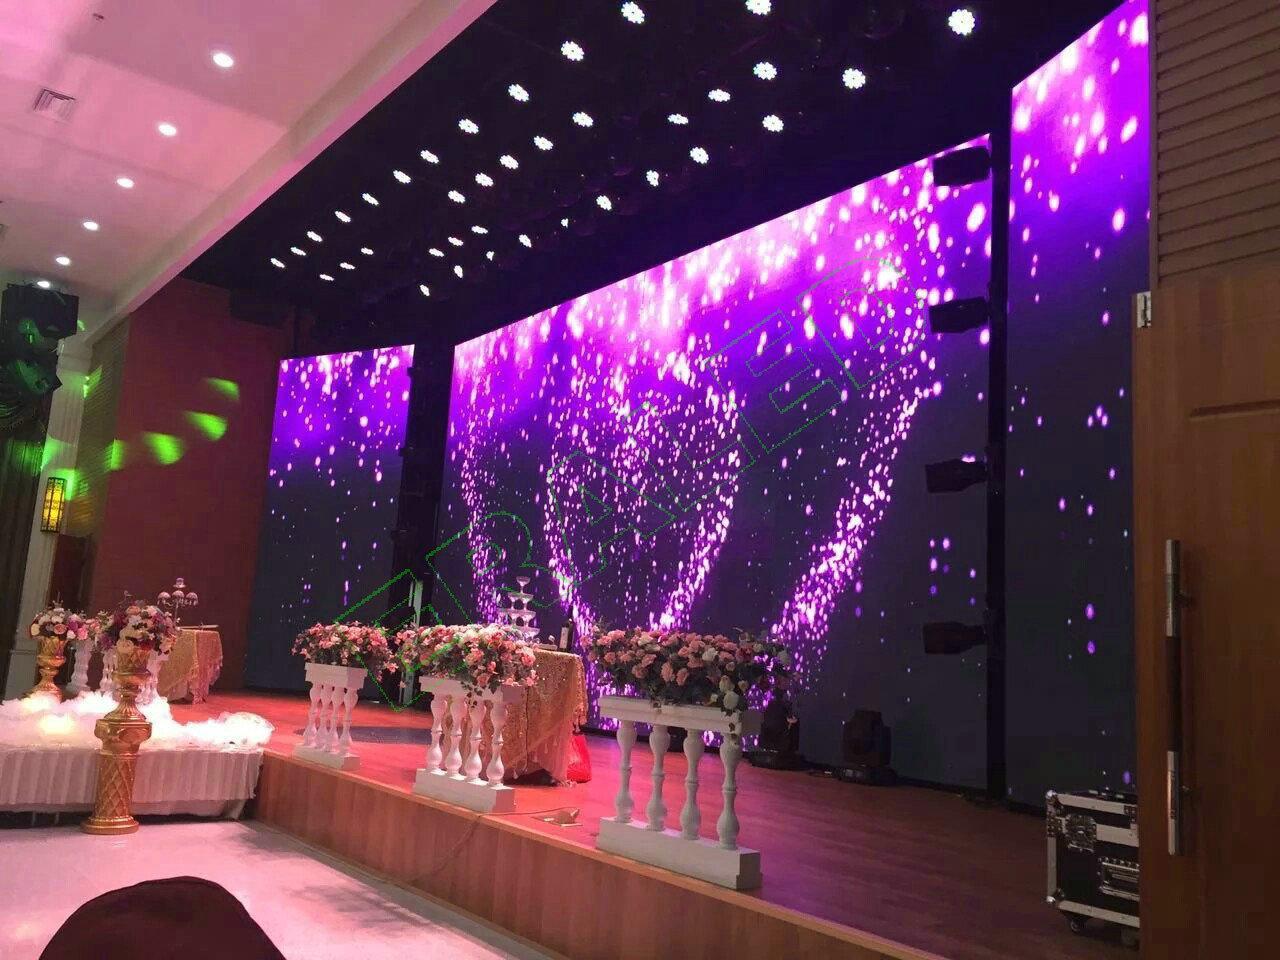 LED экран Р-4 INDOOR, размер 4,096м*3,072м-12.59 кв.м (512мм*512мм) АРЕНДНЫЙ